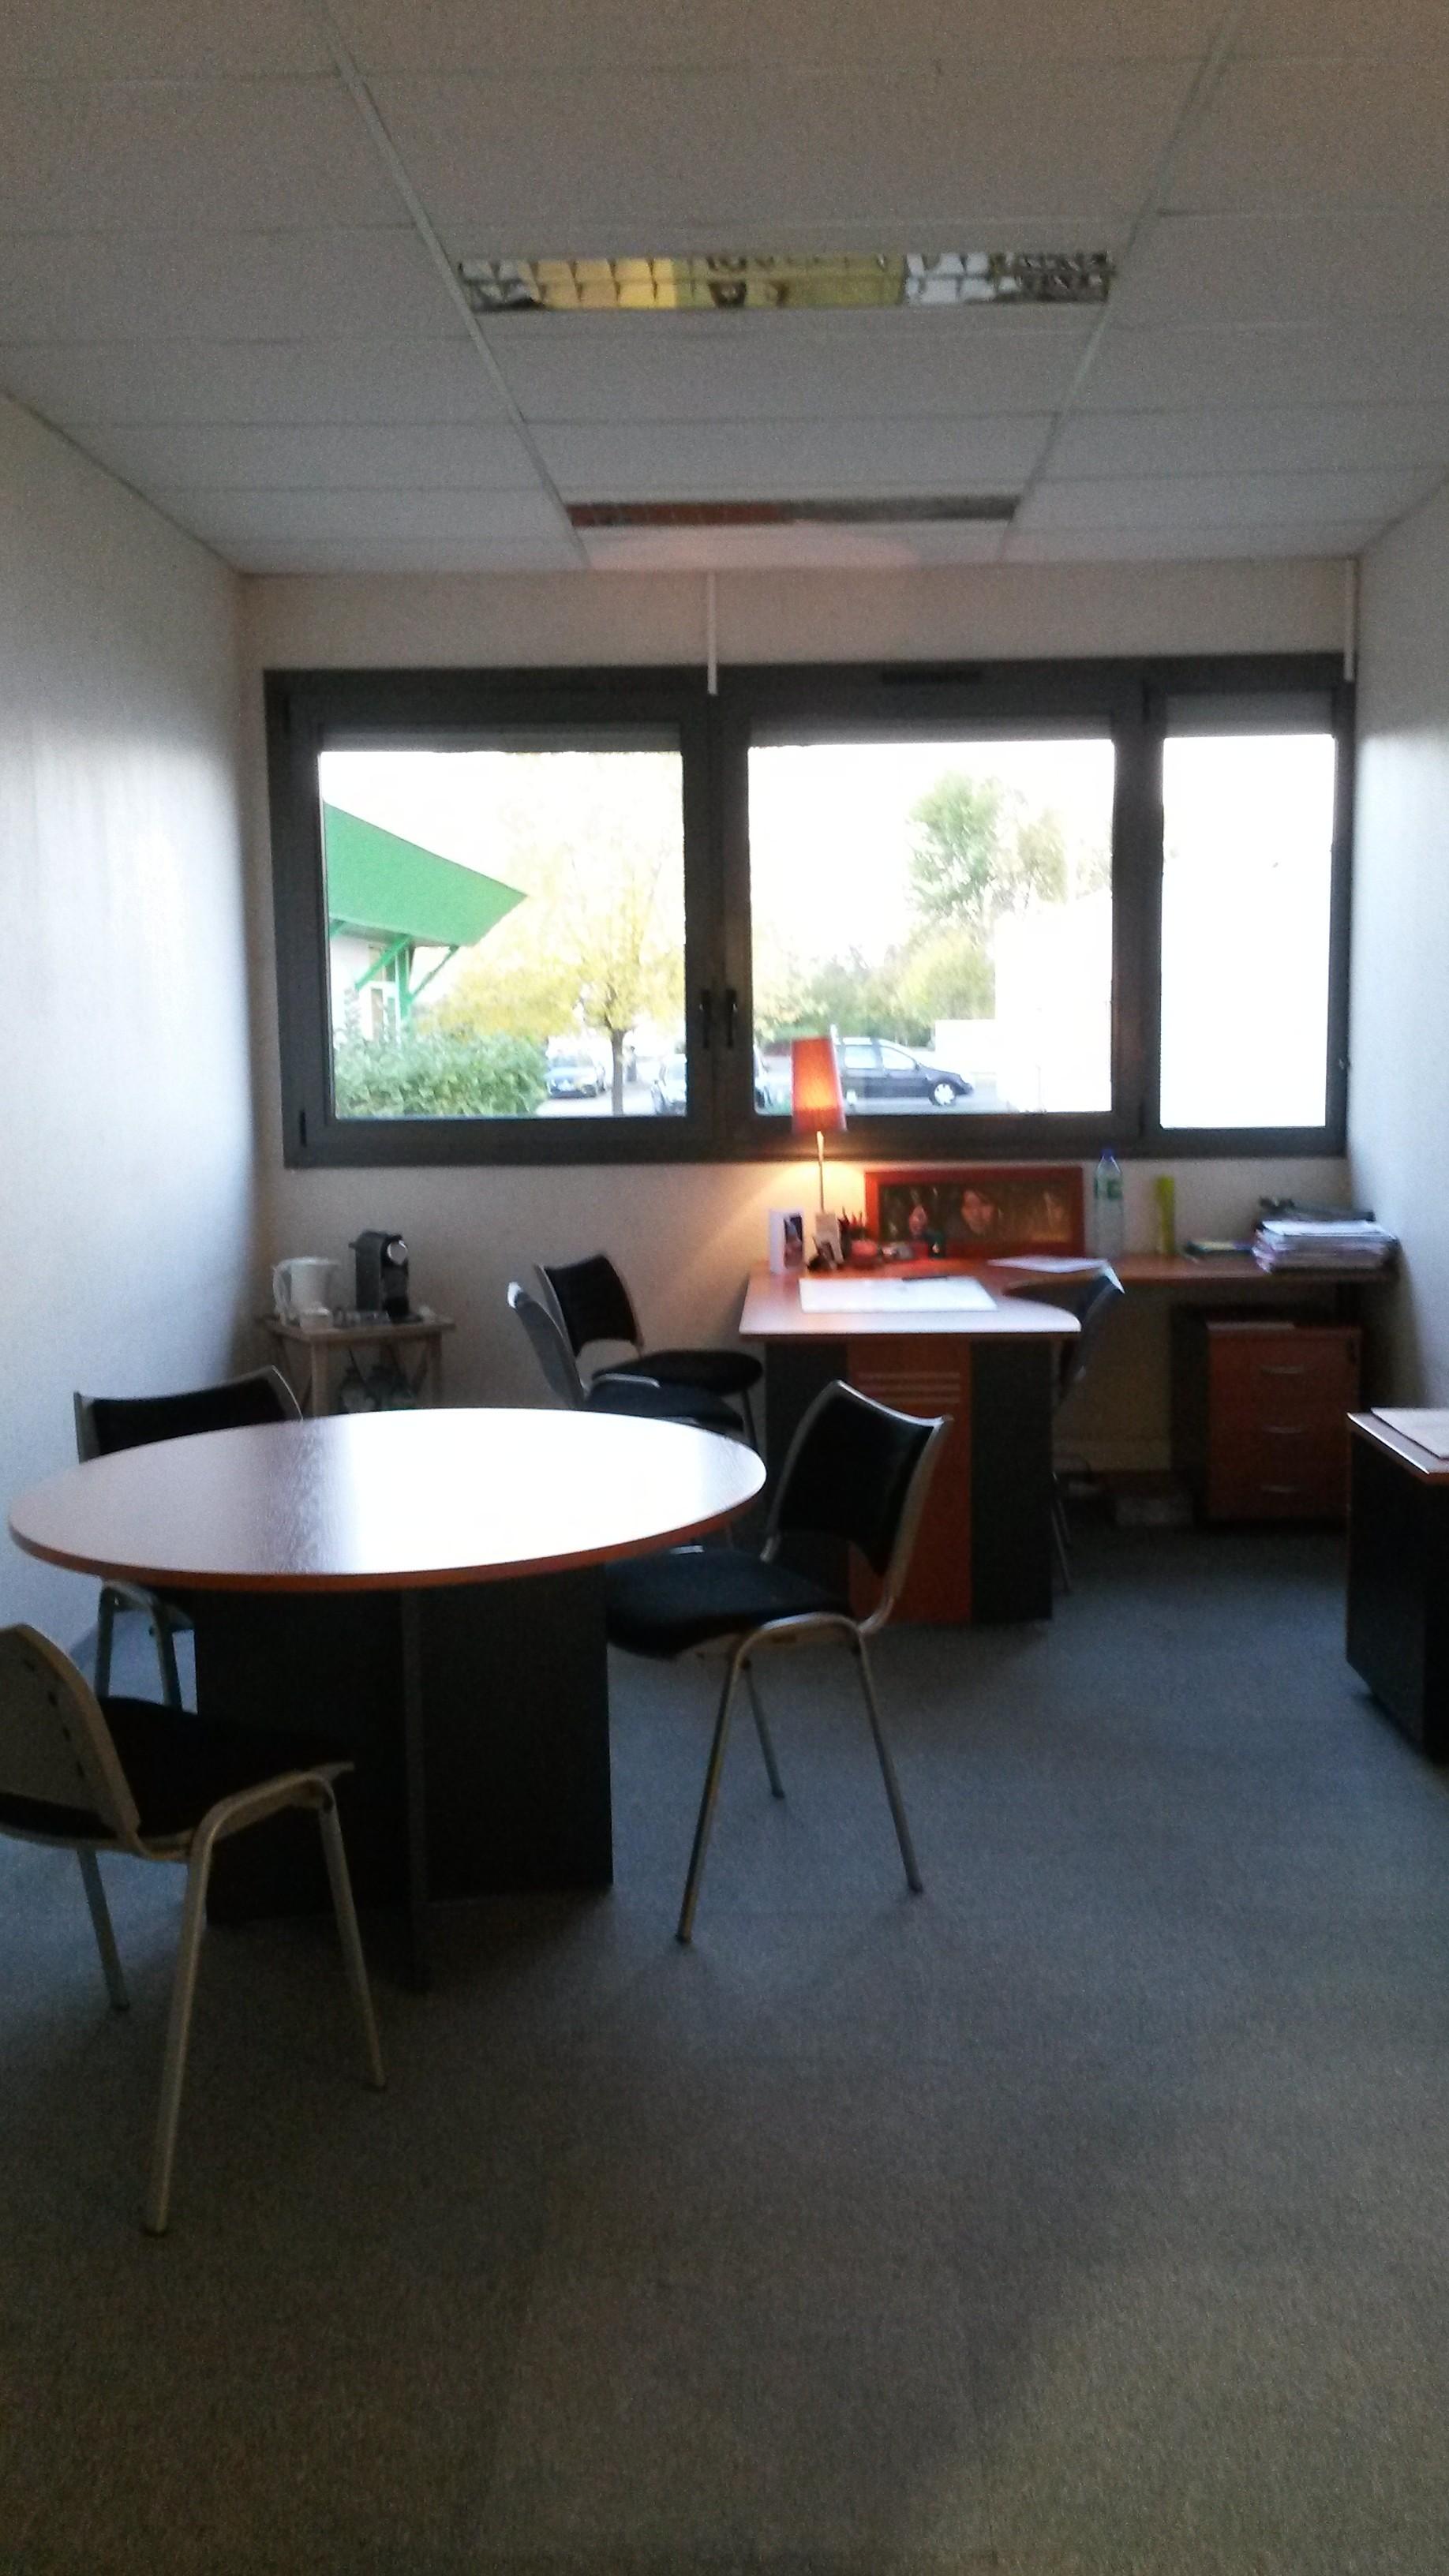 sab immobilier immobilier d 39 entreprise clermont ferrand. Black Bedroom Furniture Sets. Home Design Ideas